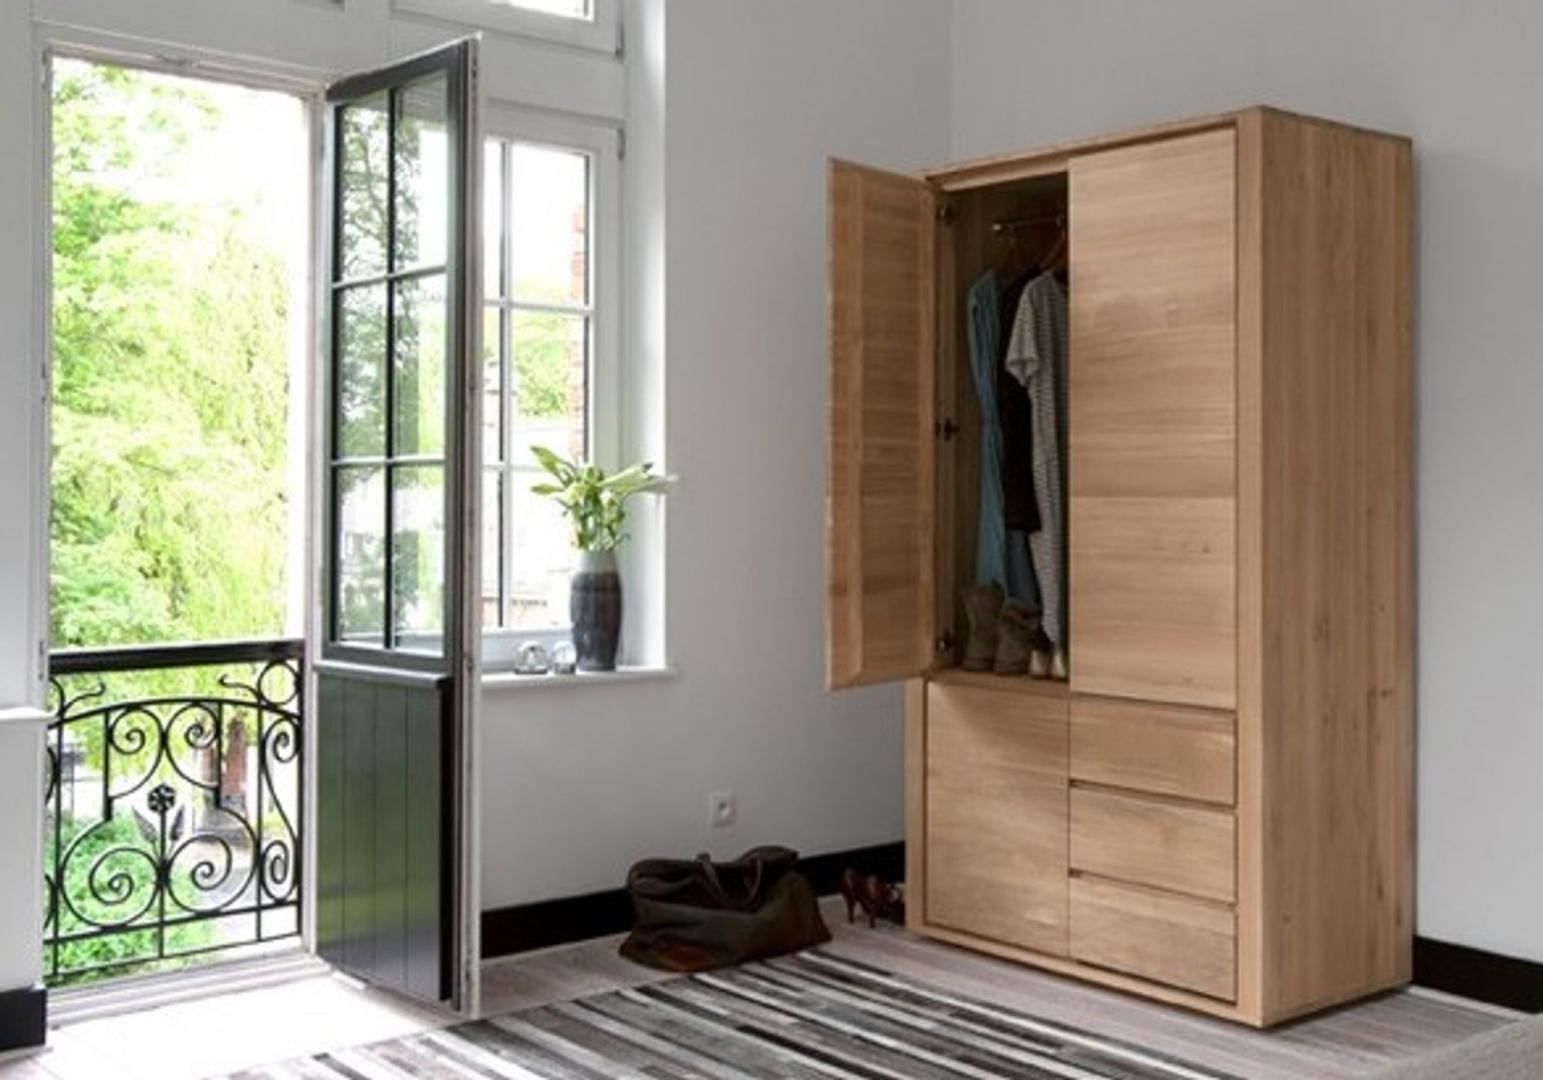 Penderie Shadow en chene - 3 portes / 2 tiroirs - ETHNICRAFT